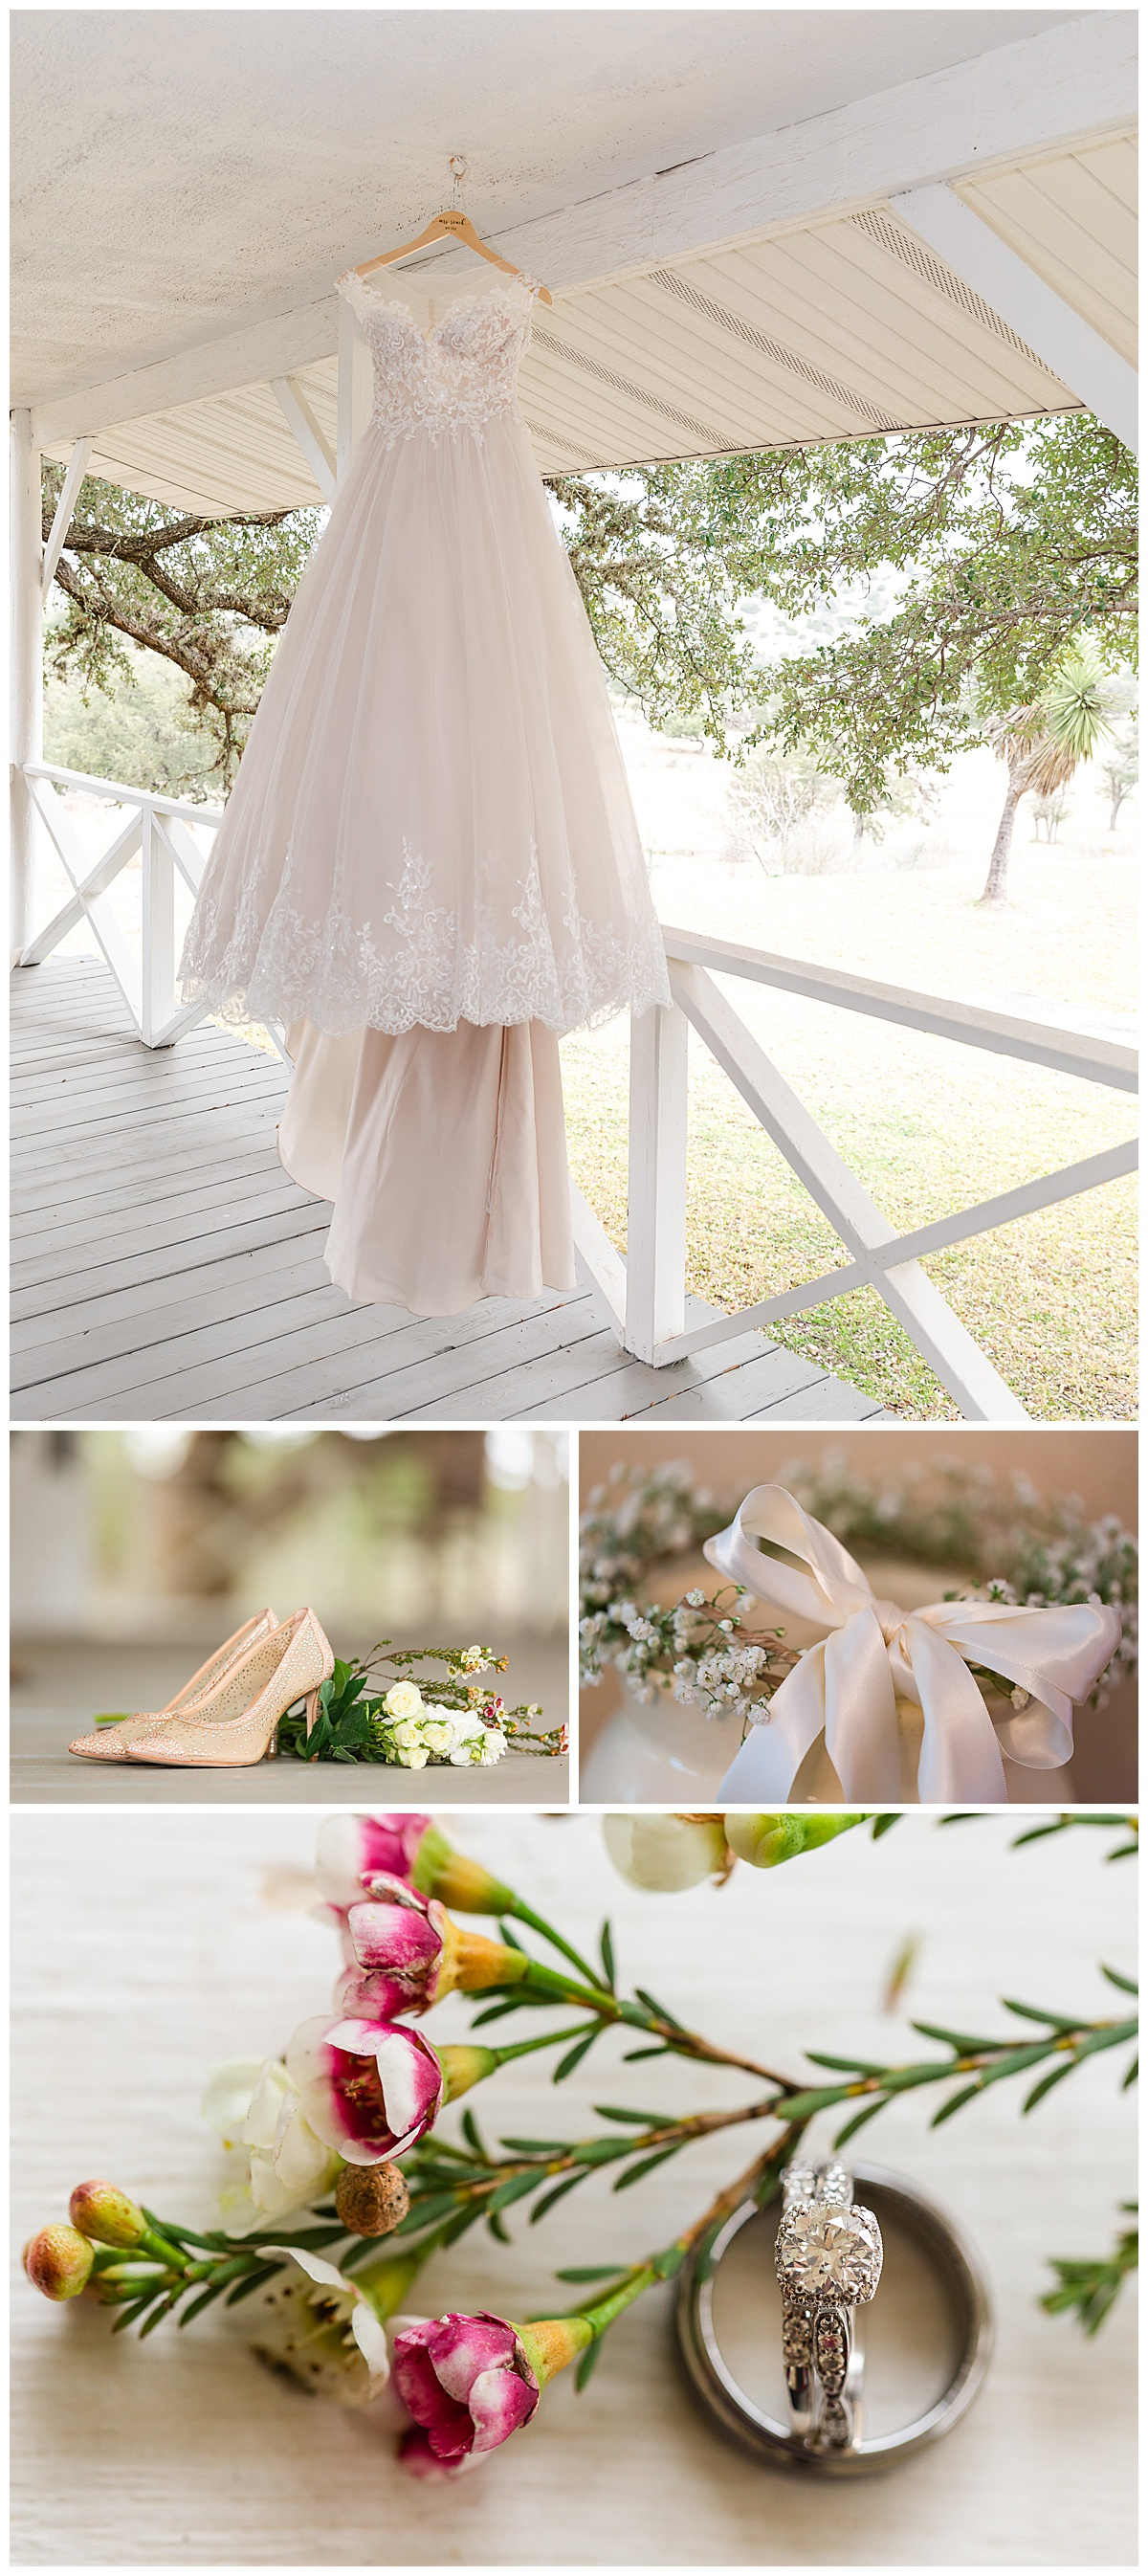 Wedding-Photographer-Texas-Hill-Country-Happy-H-Ranch-Comfor-Texas-Carly-Barton-Photography_0006.jpg